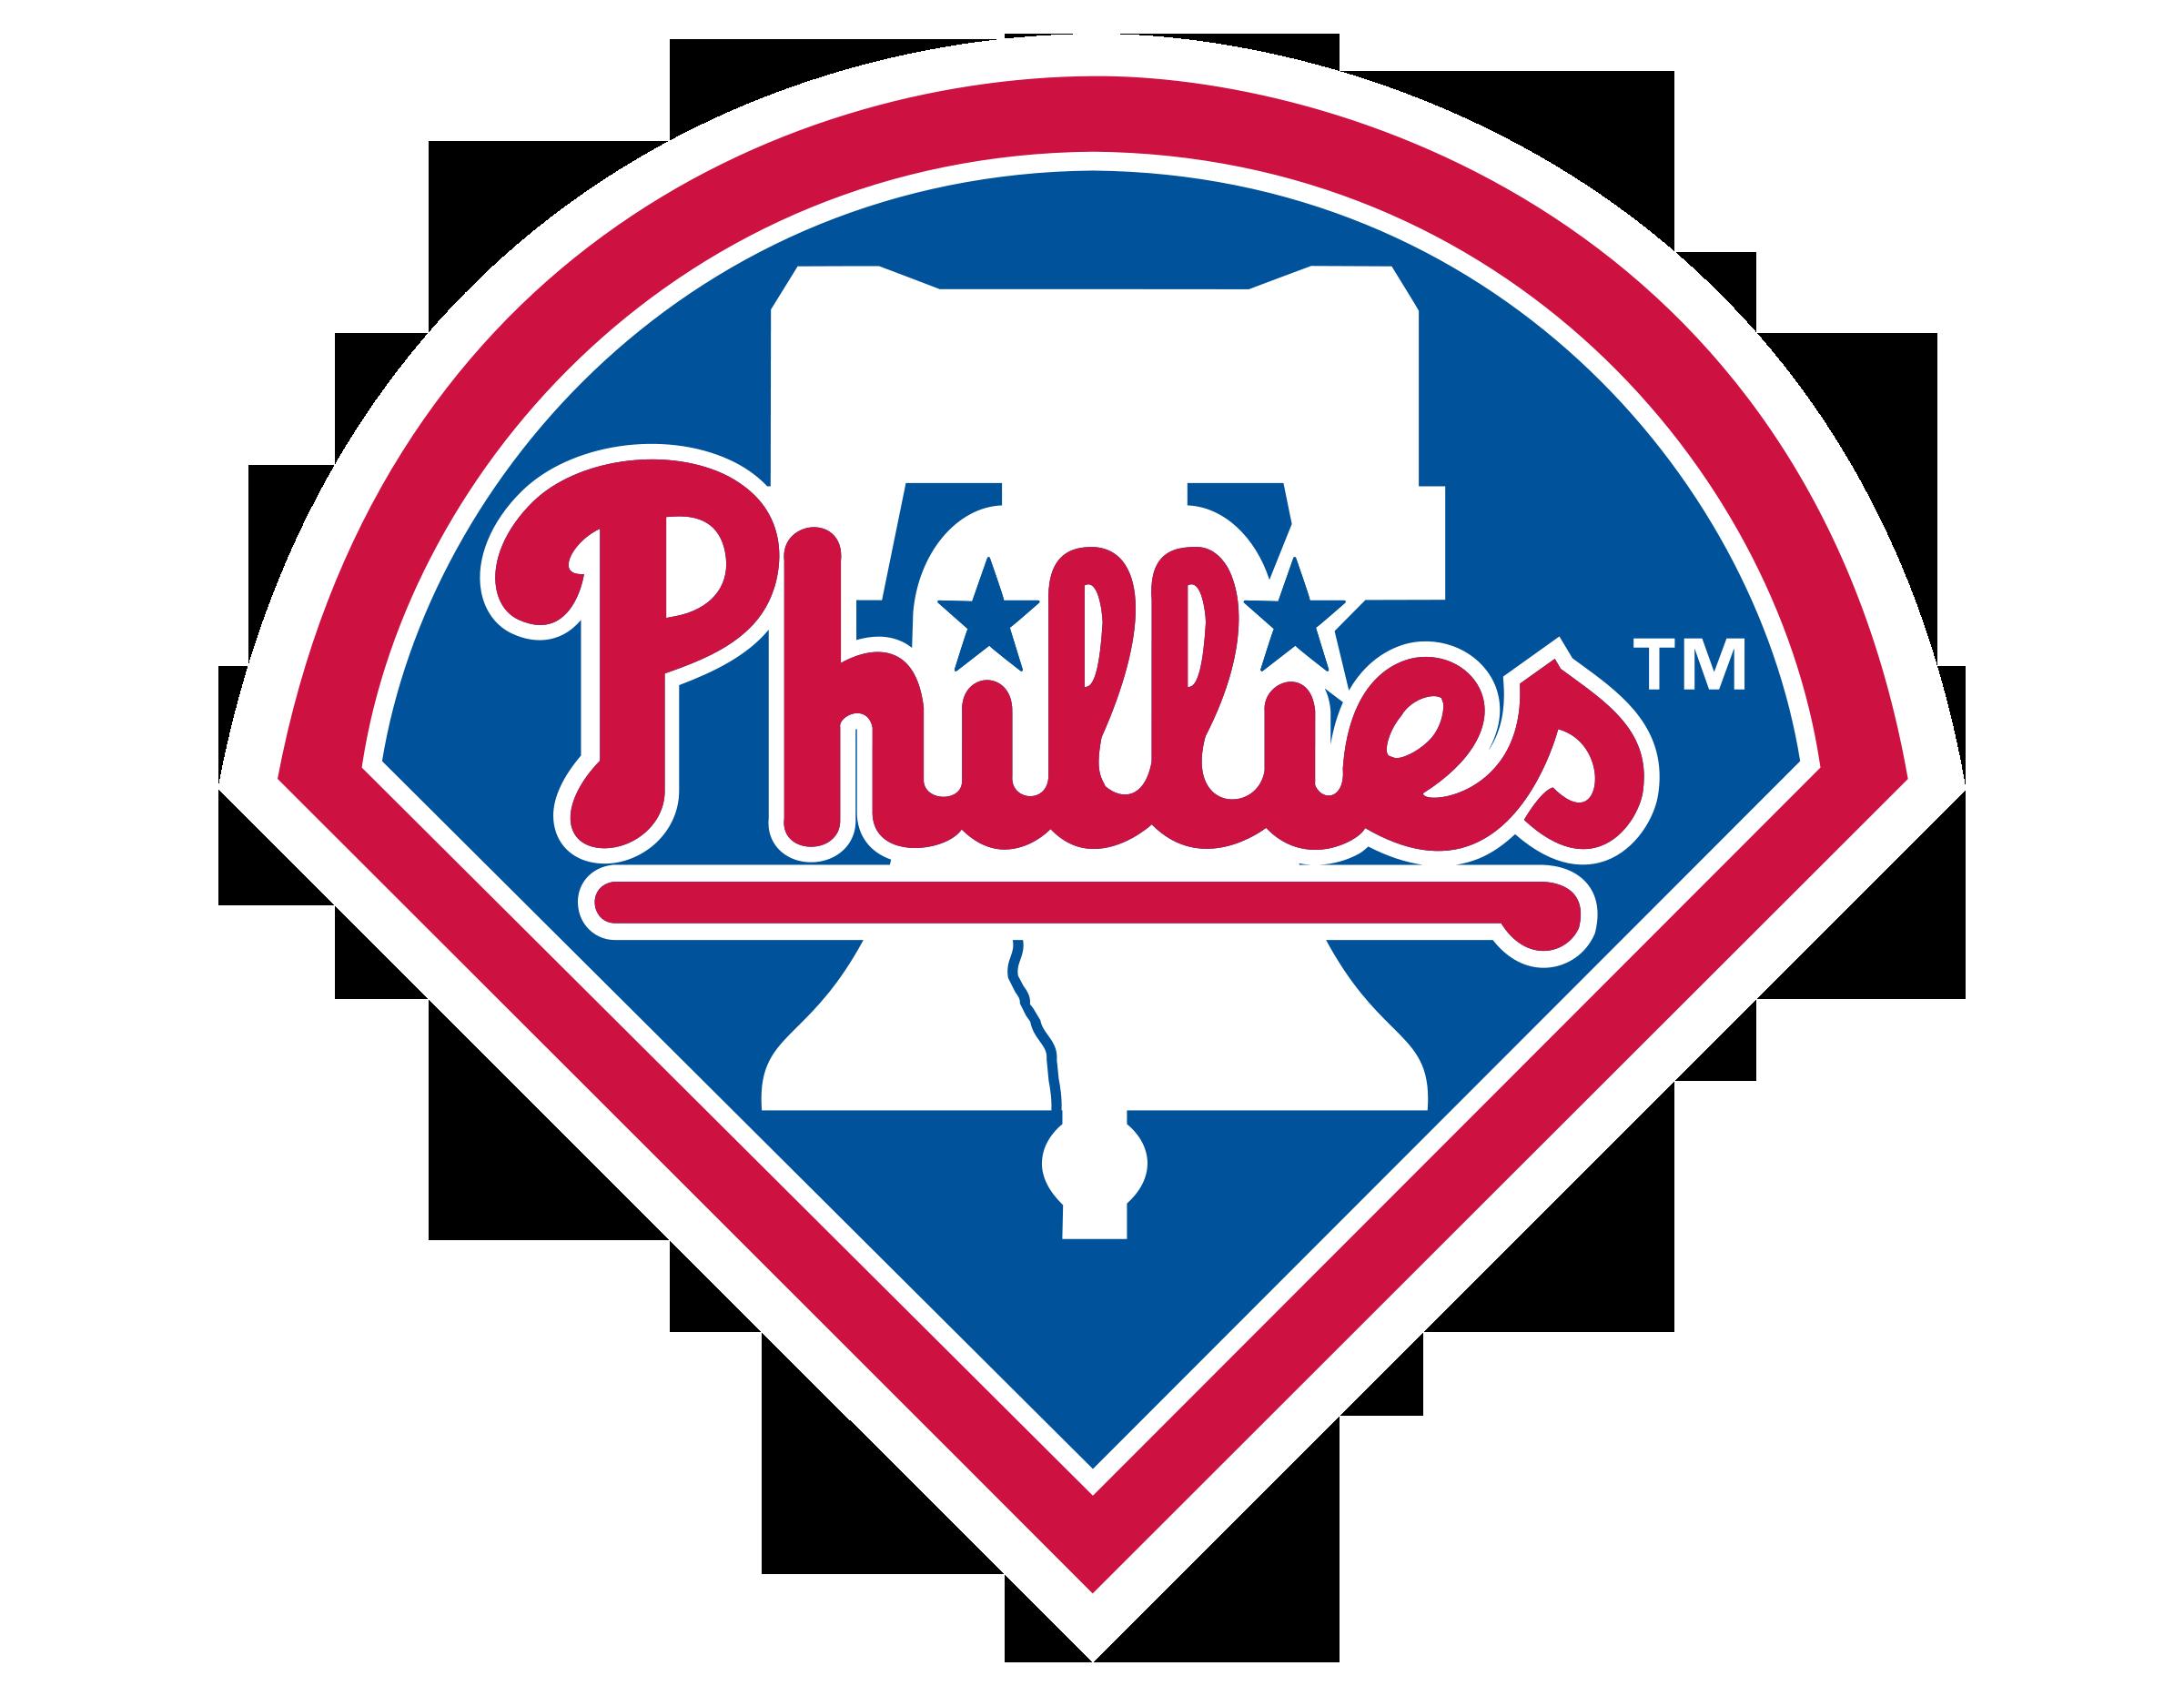 philadelphia phillies logo phillies symbol meaning history and rh 1000logos net phillies logo pic